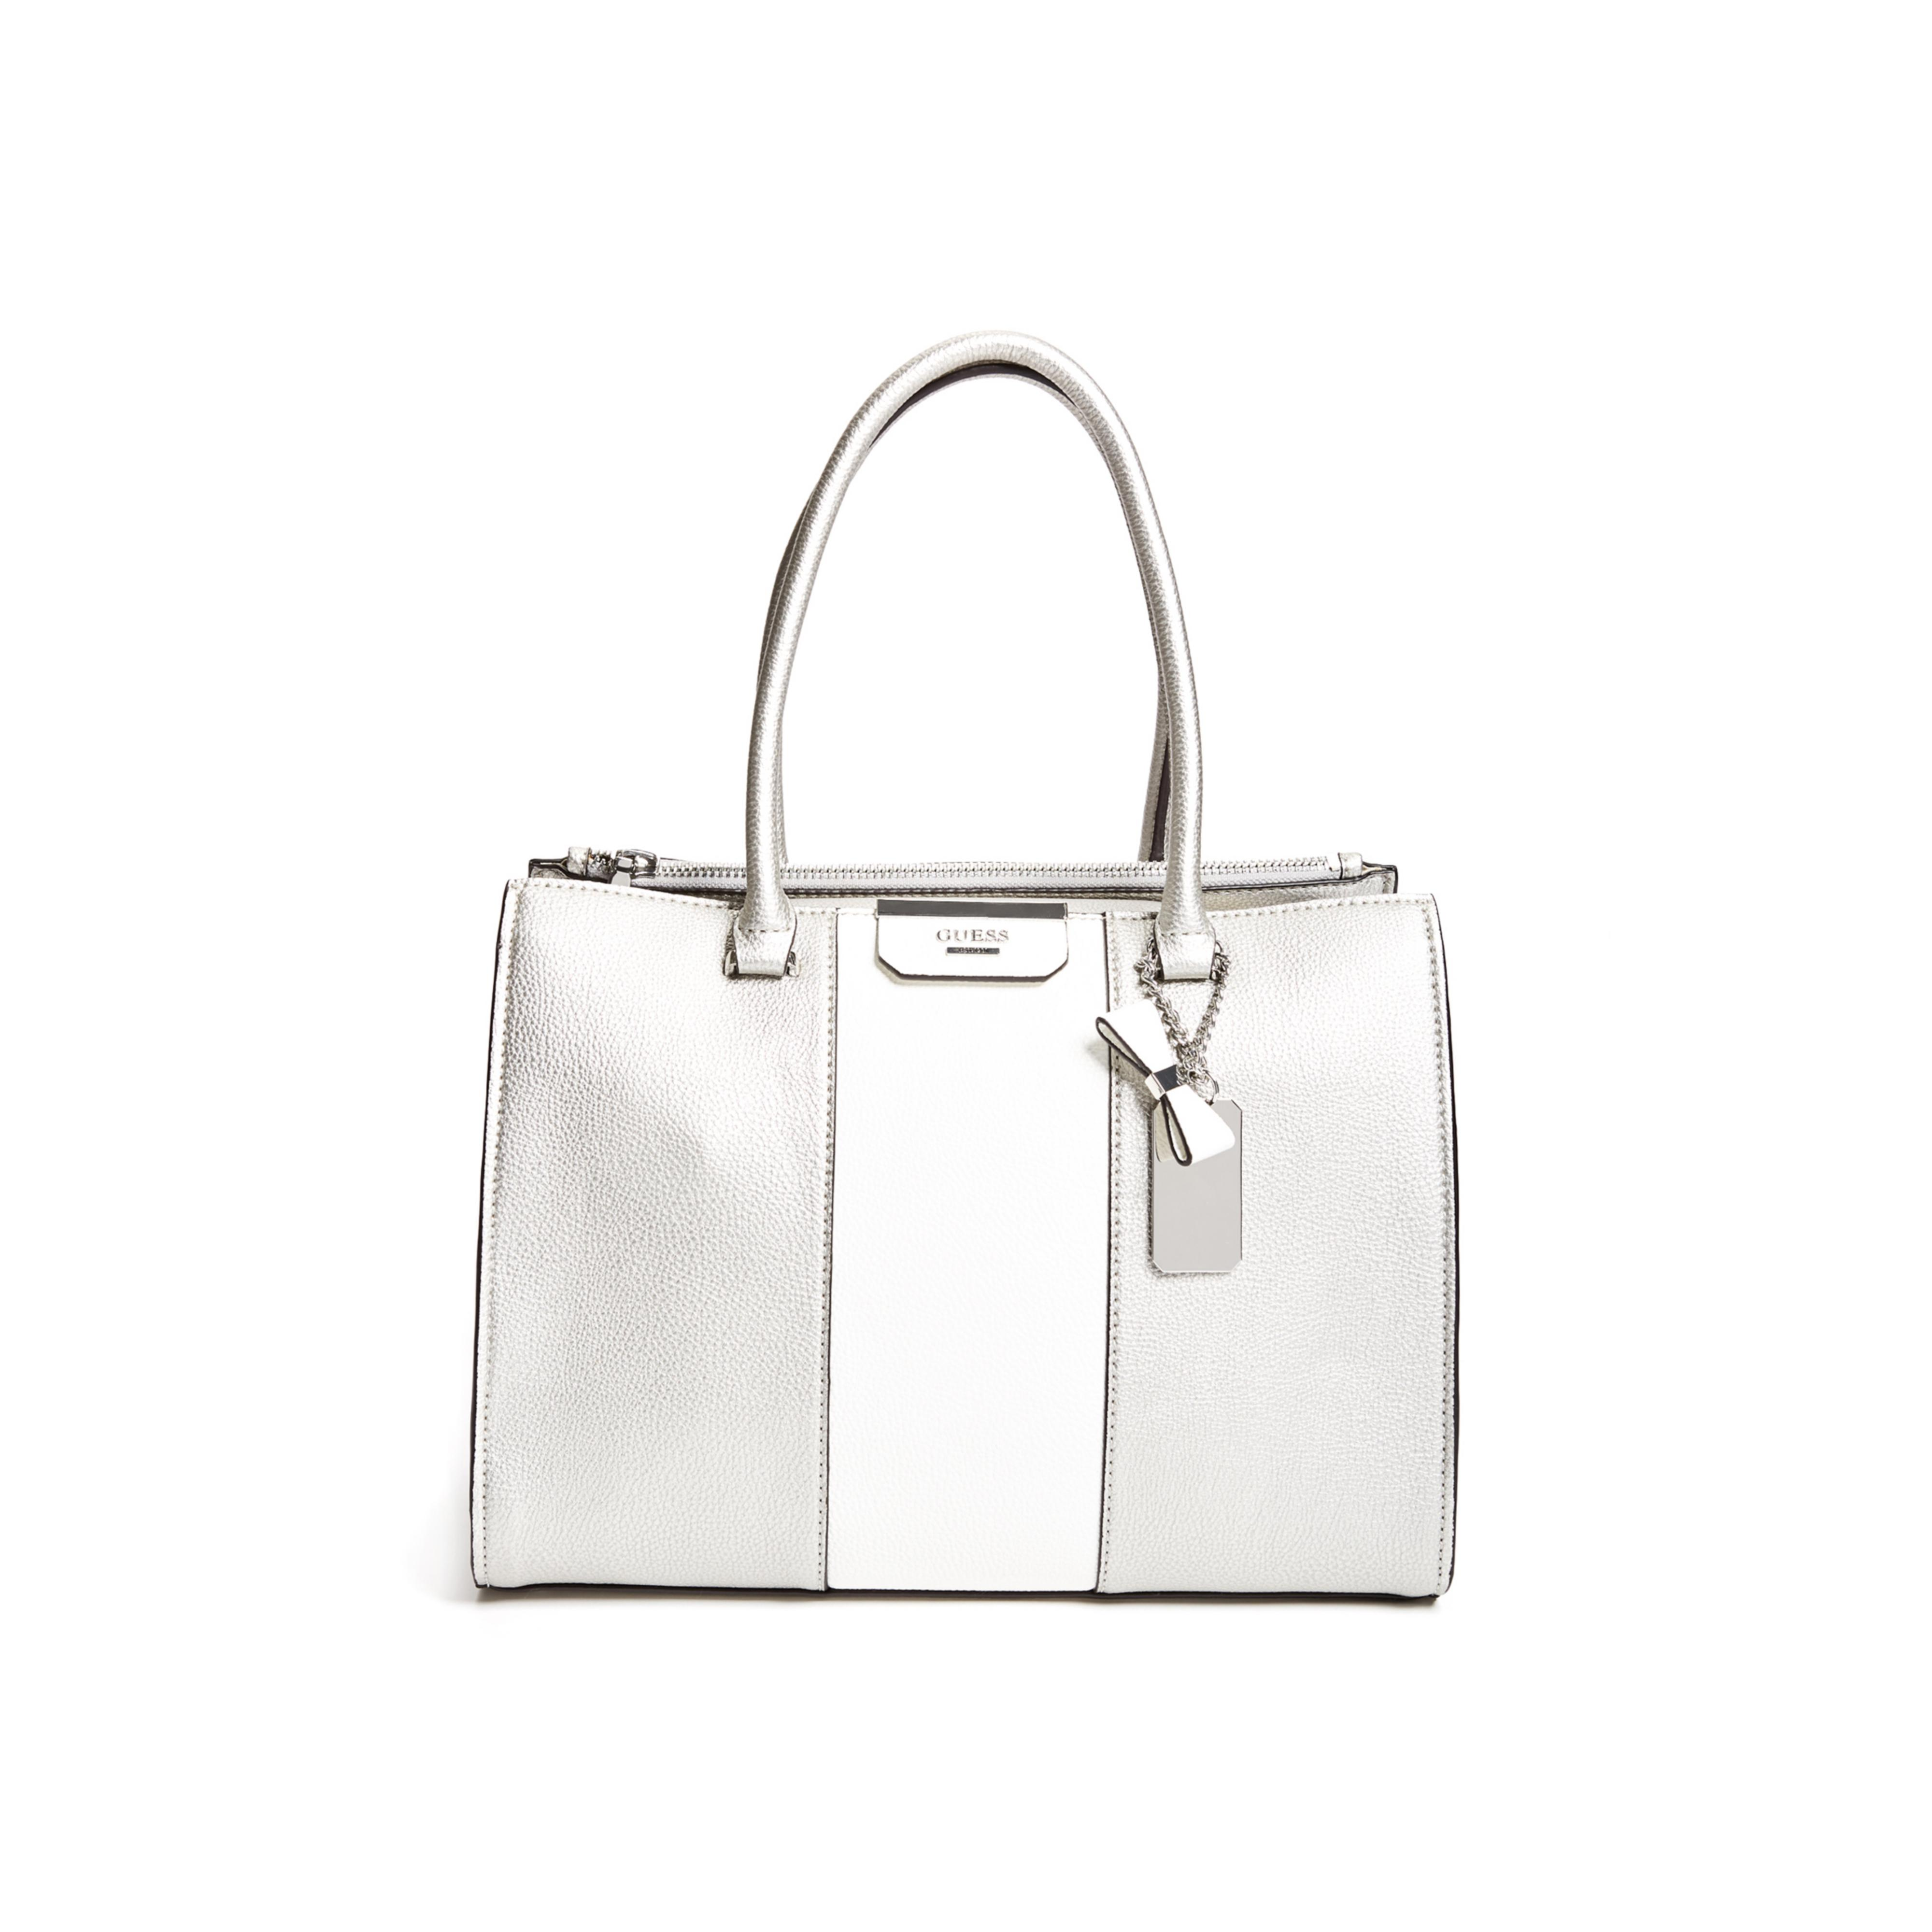 25 Off Guess Handbags Wallets Strandbags Bargain Bro New Zealand